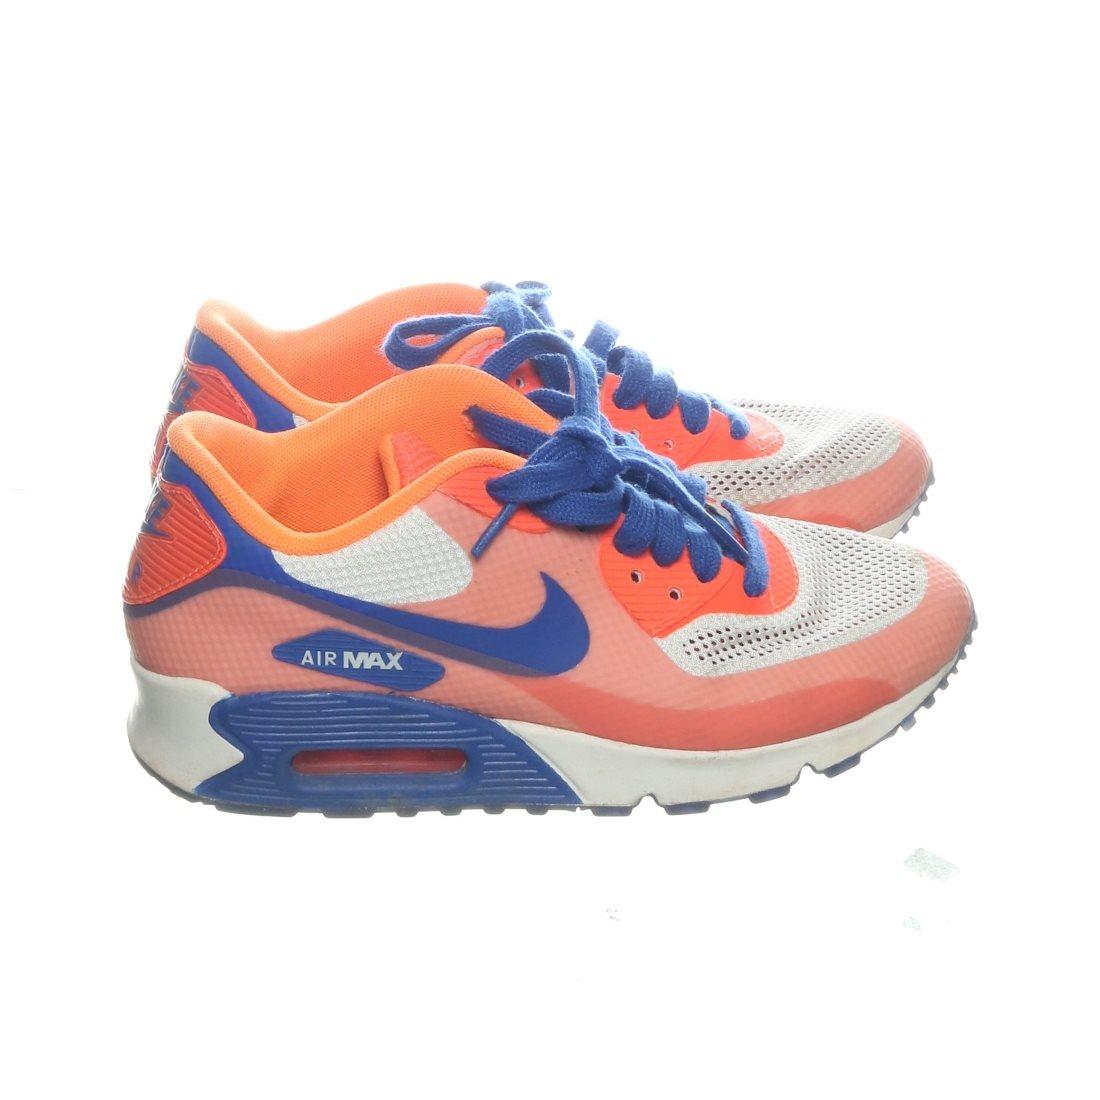 official photos b4cd0 fd703 Nike, Sneakers, Strl  36.5, Air Max, Orange Lila Flerfärgad